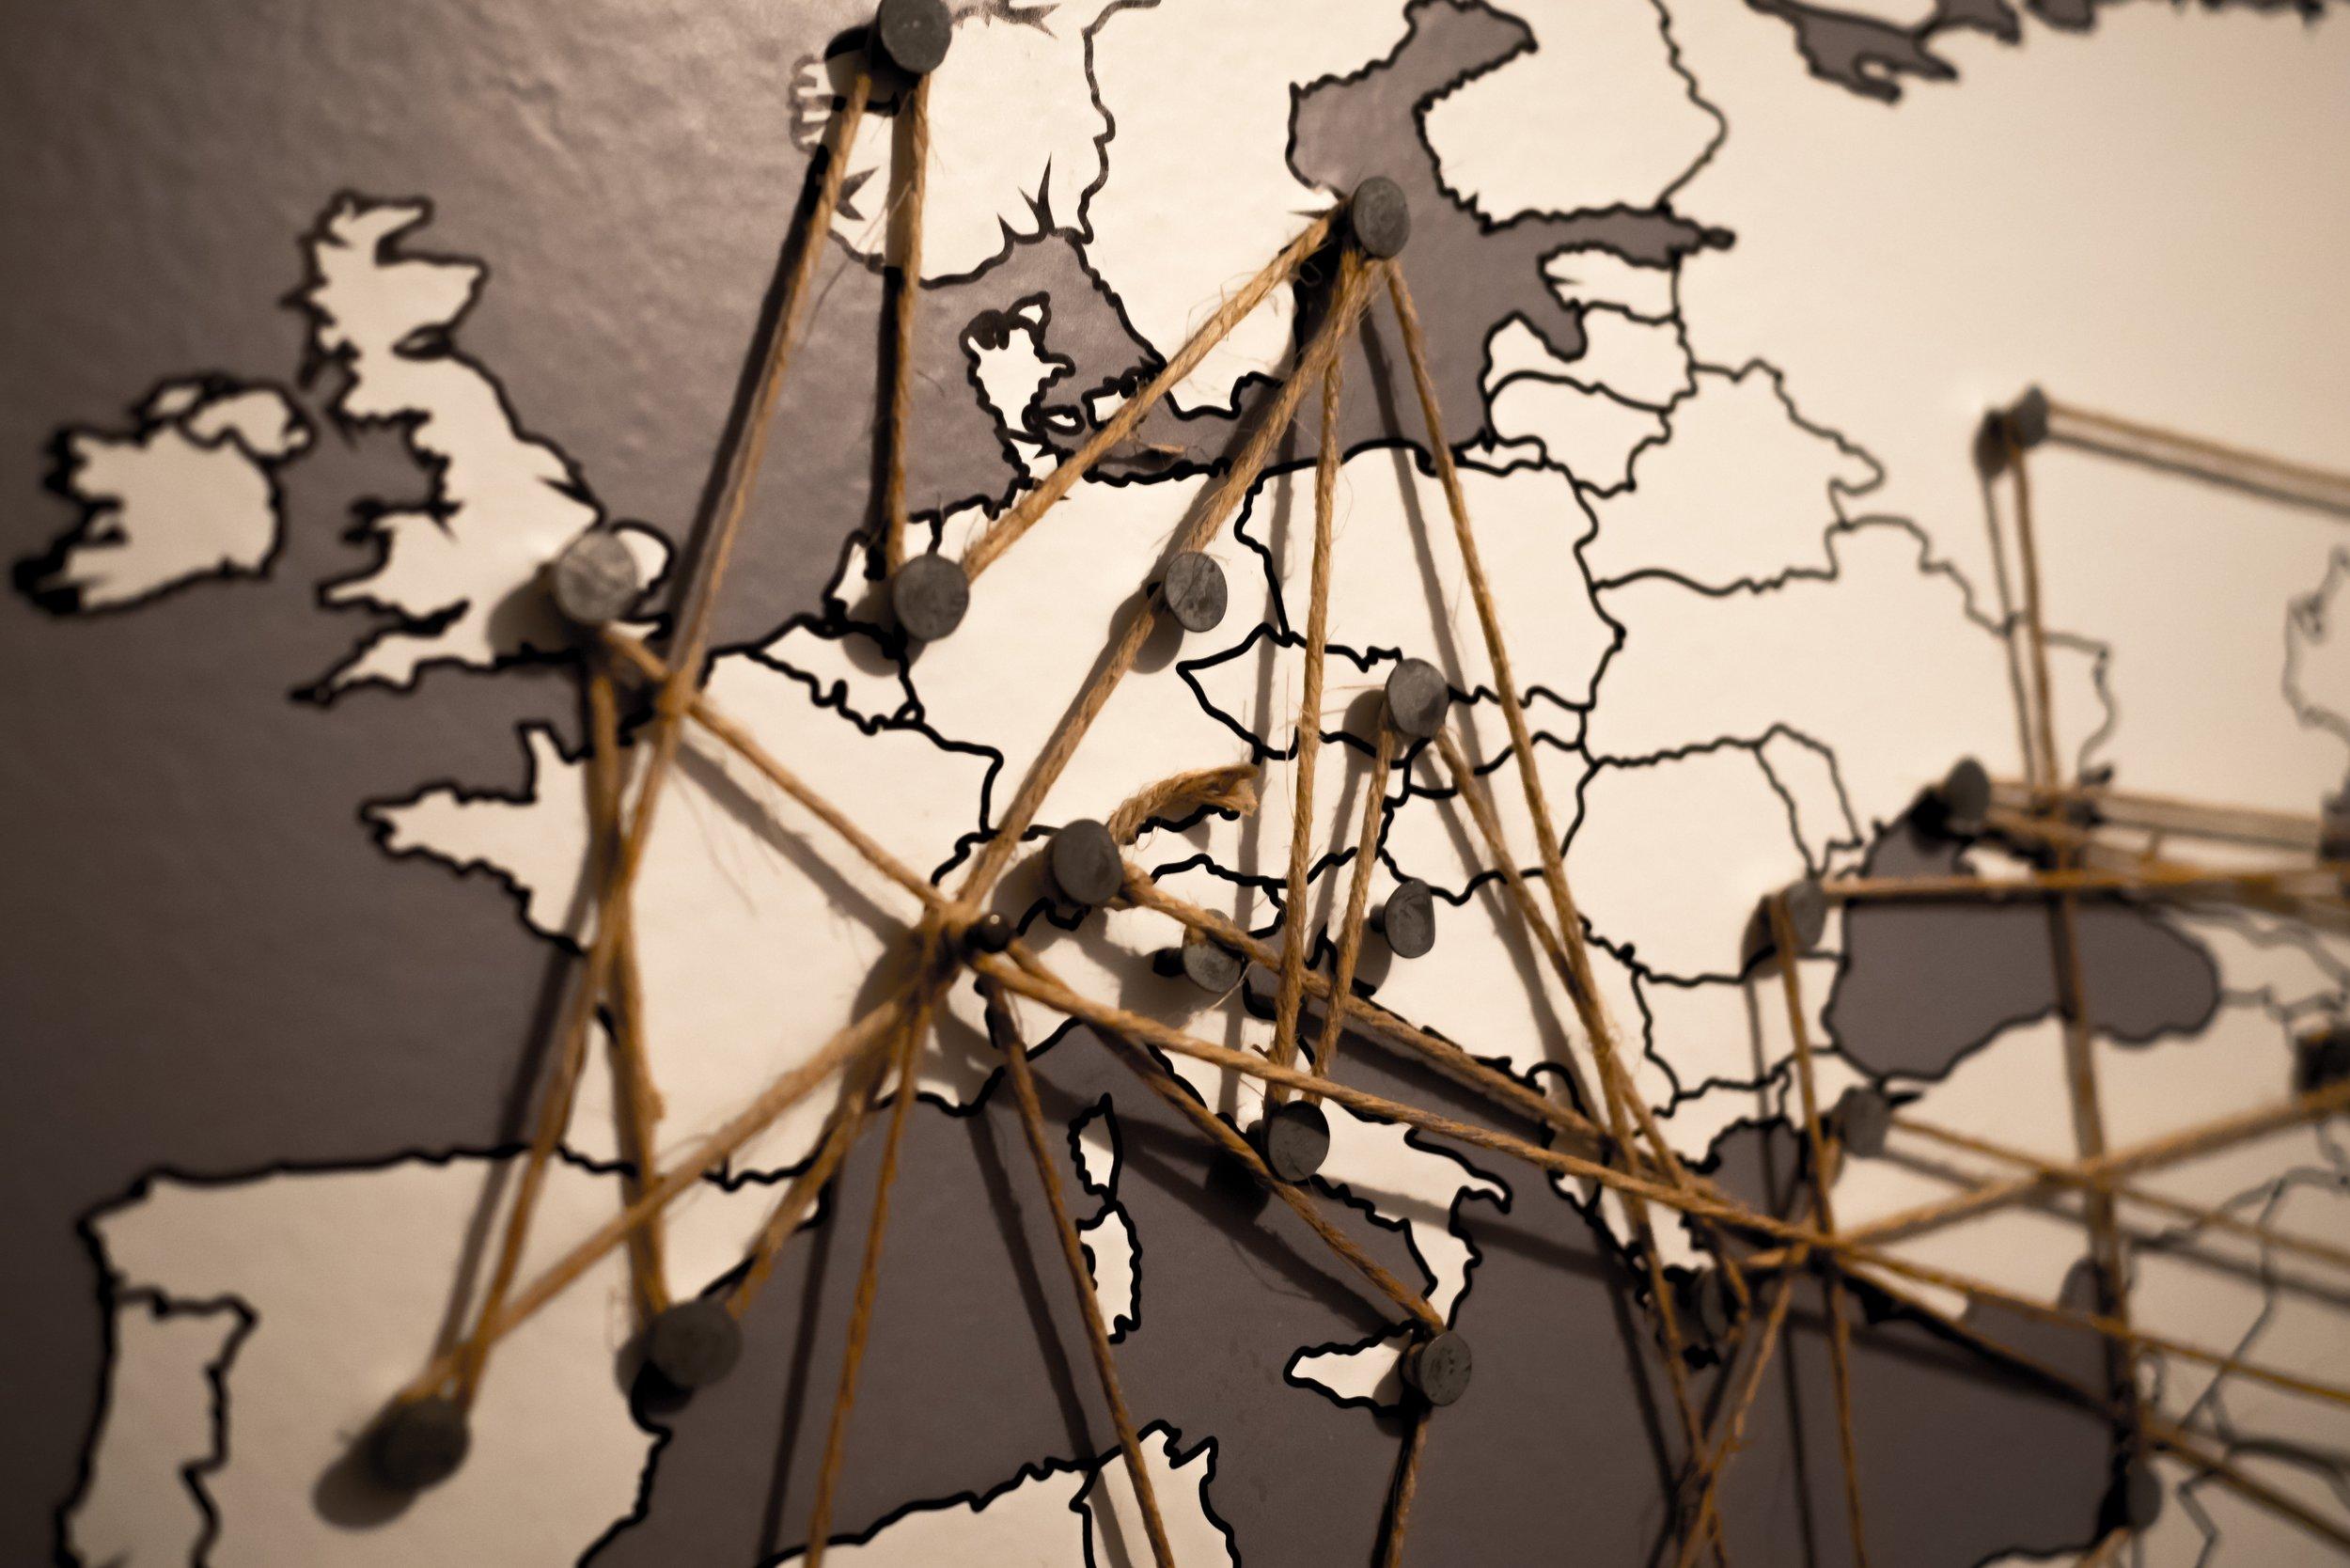 branch-wall-travel-europe-spring-lighting-1223364-pxhere.com.jpg